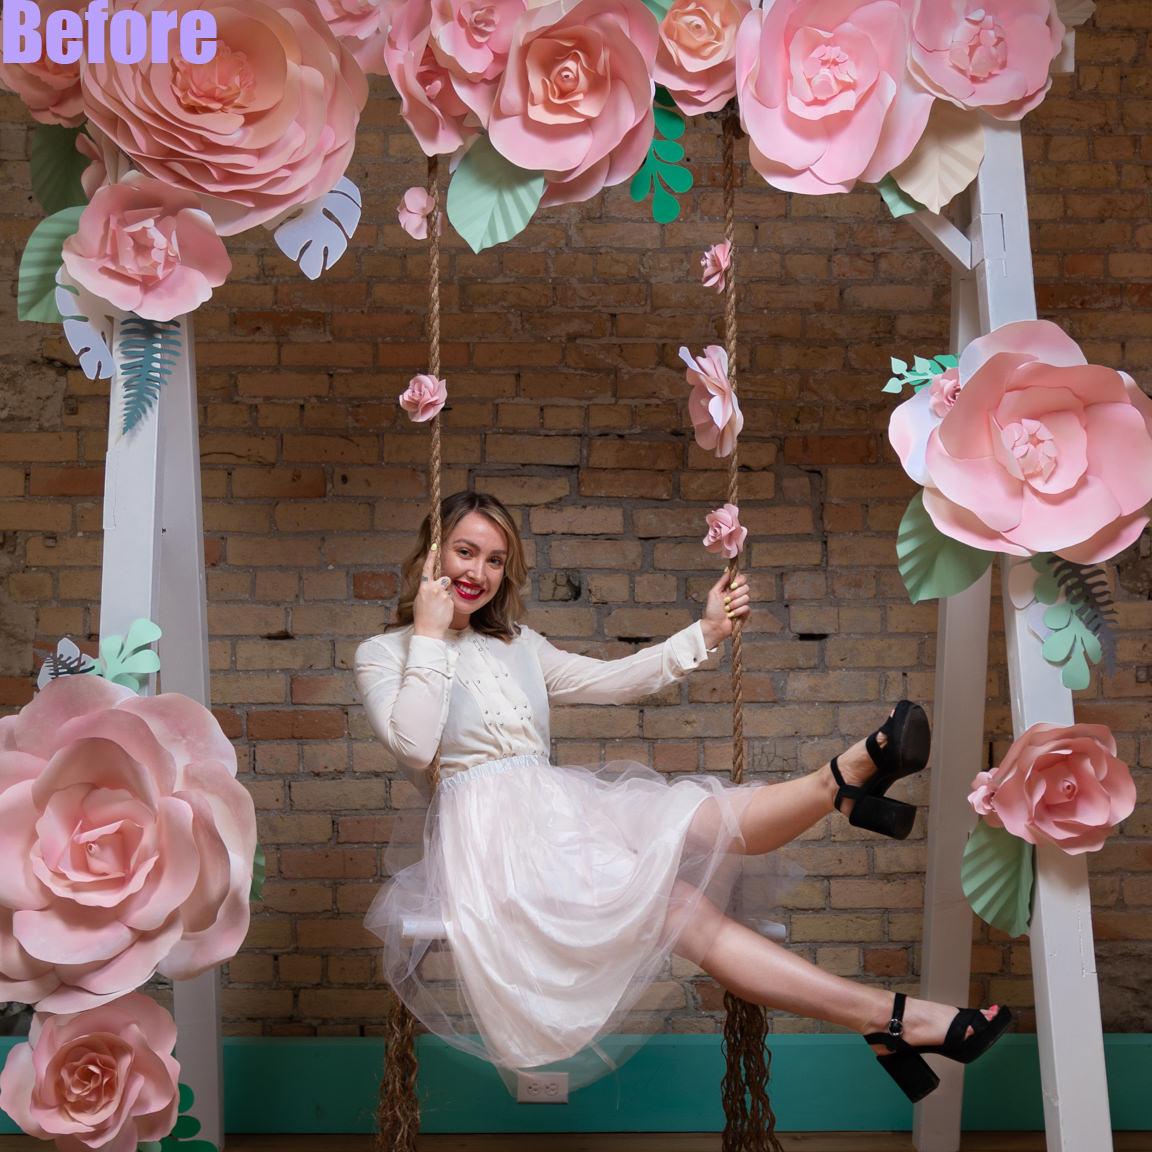 before edit-woman on swing